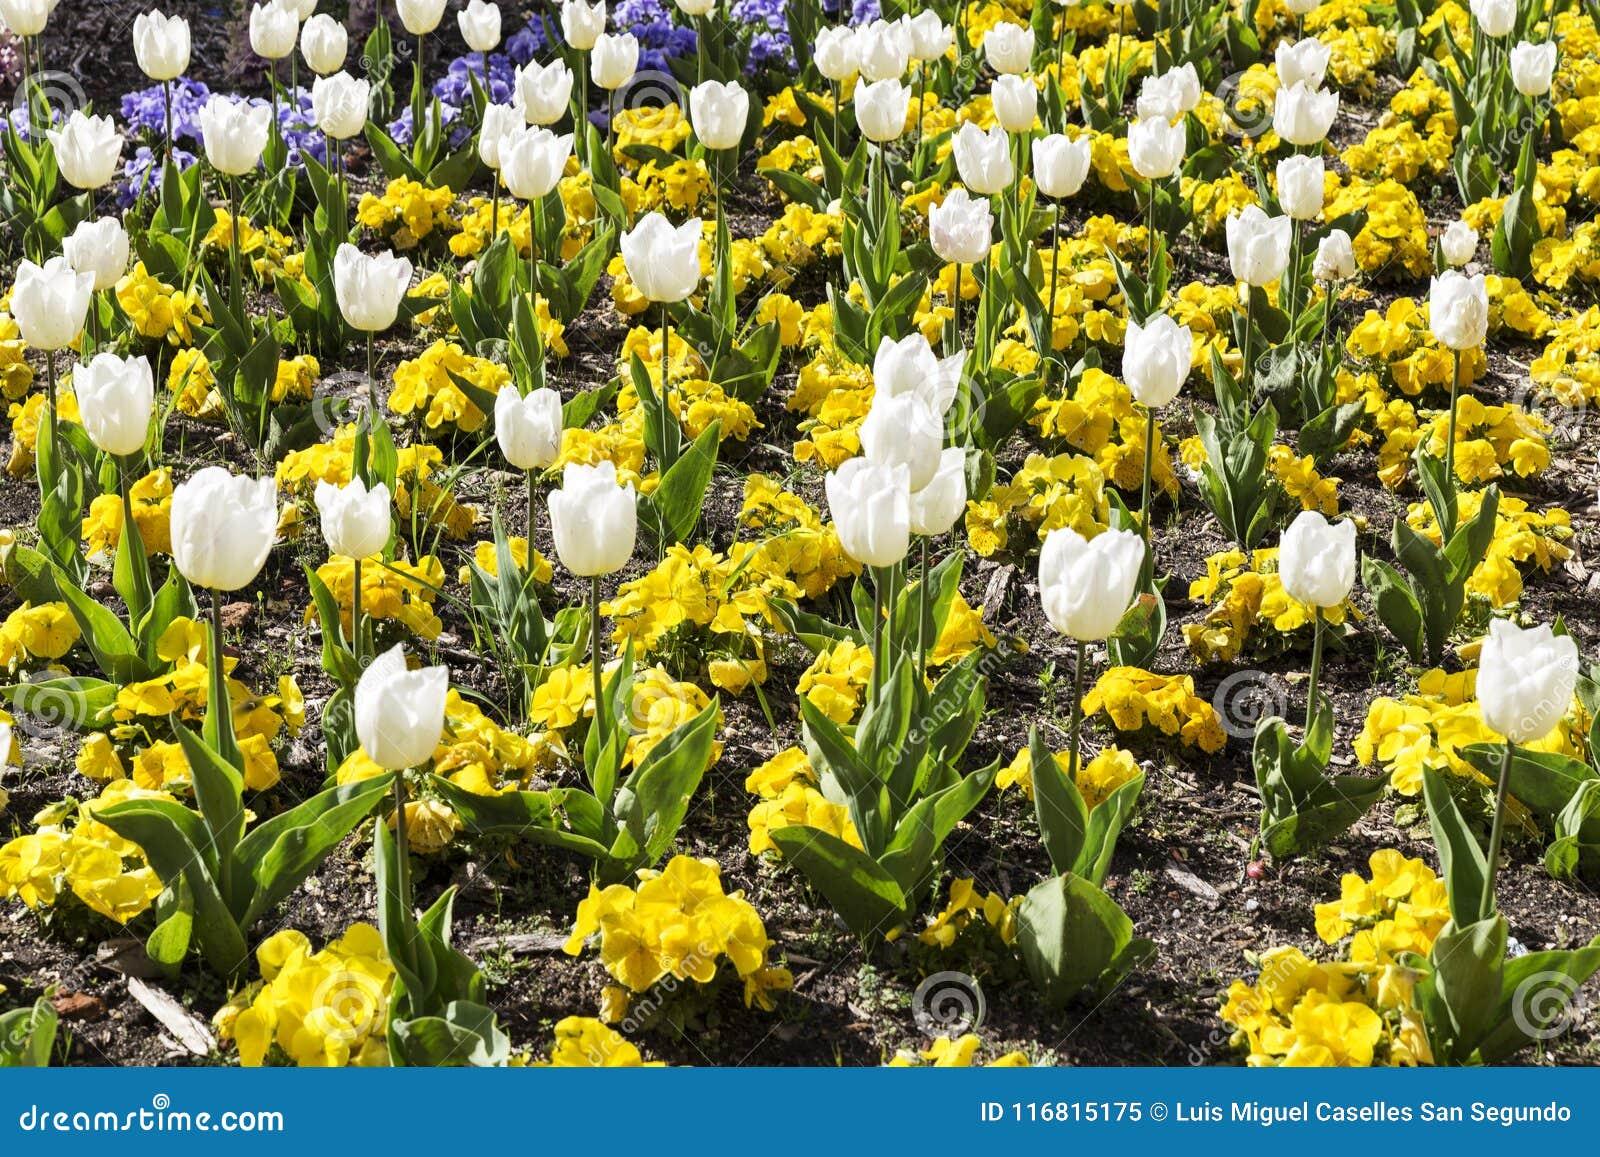 gardin Gardin Flowered With Different Colored Flowers Stock Image   Image  gardin